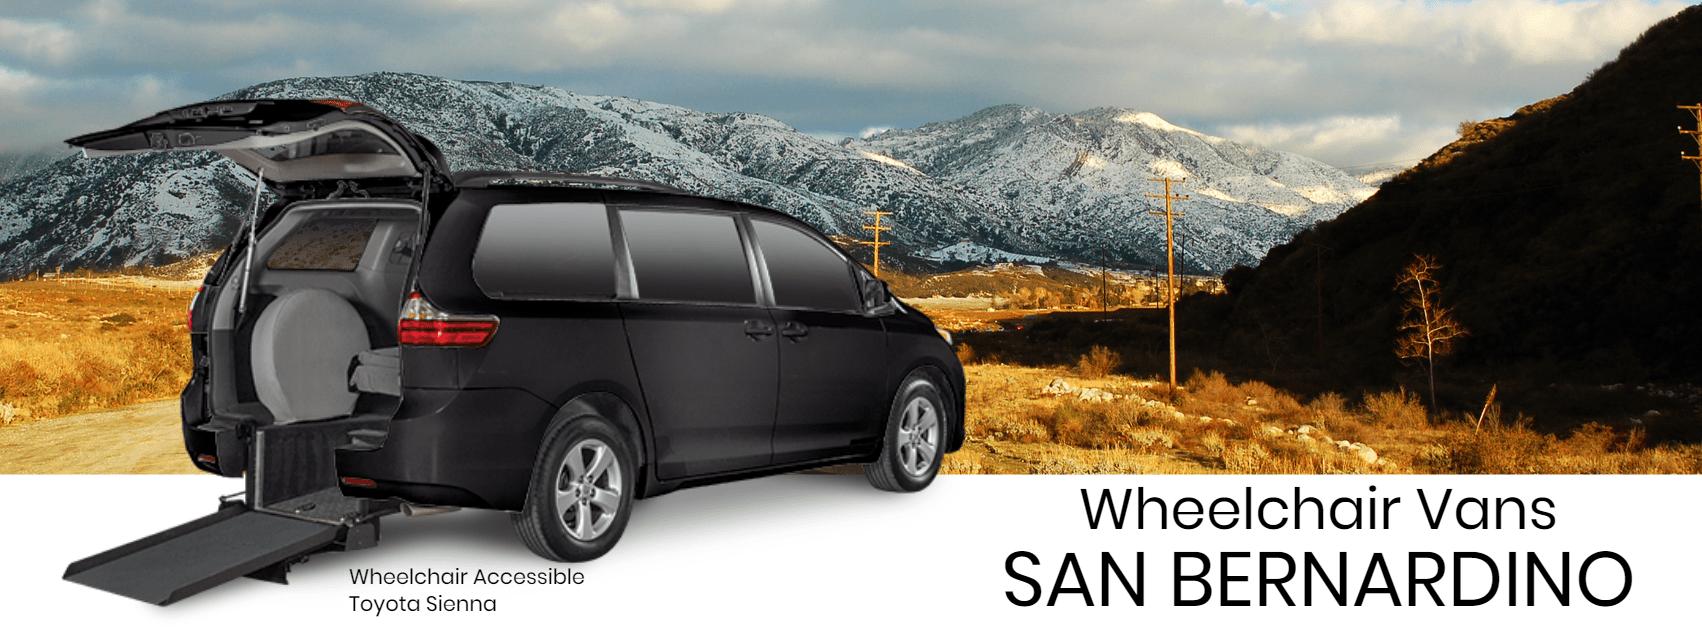 Wheelchair Accessible Vans >> Wheelchair Vans For Sale In San Bernardino Aero Mobility